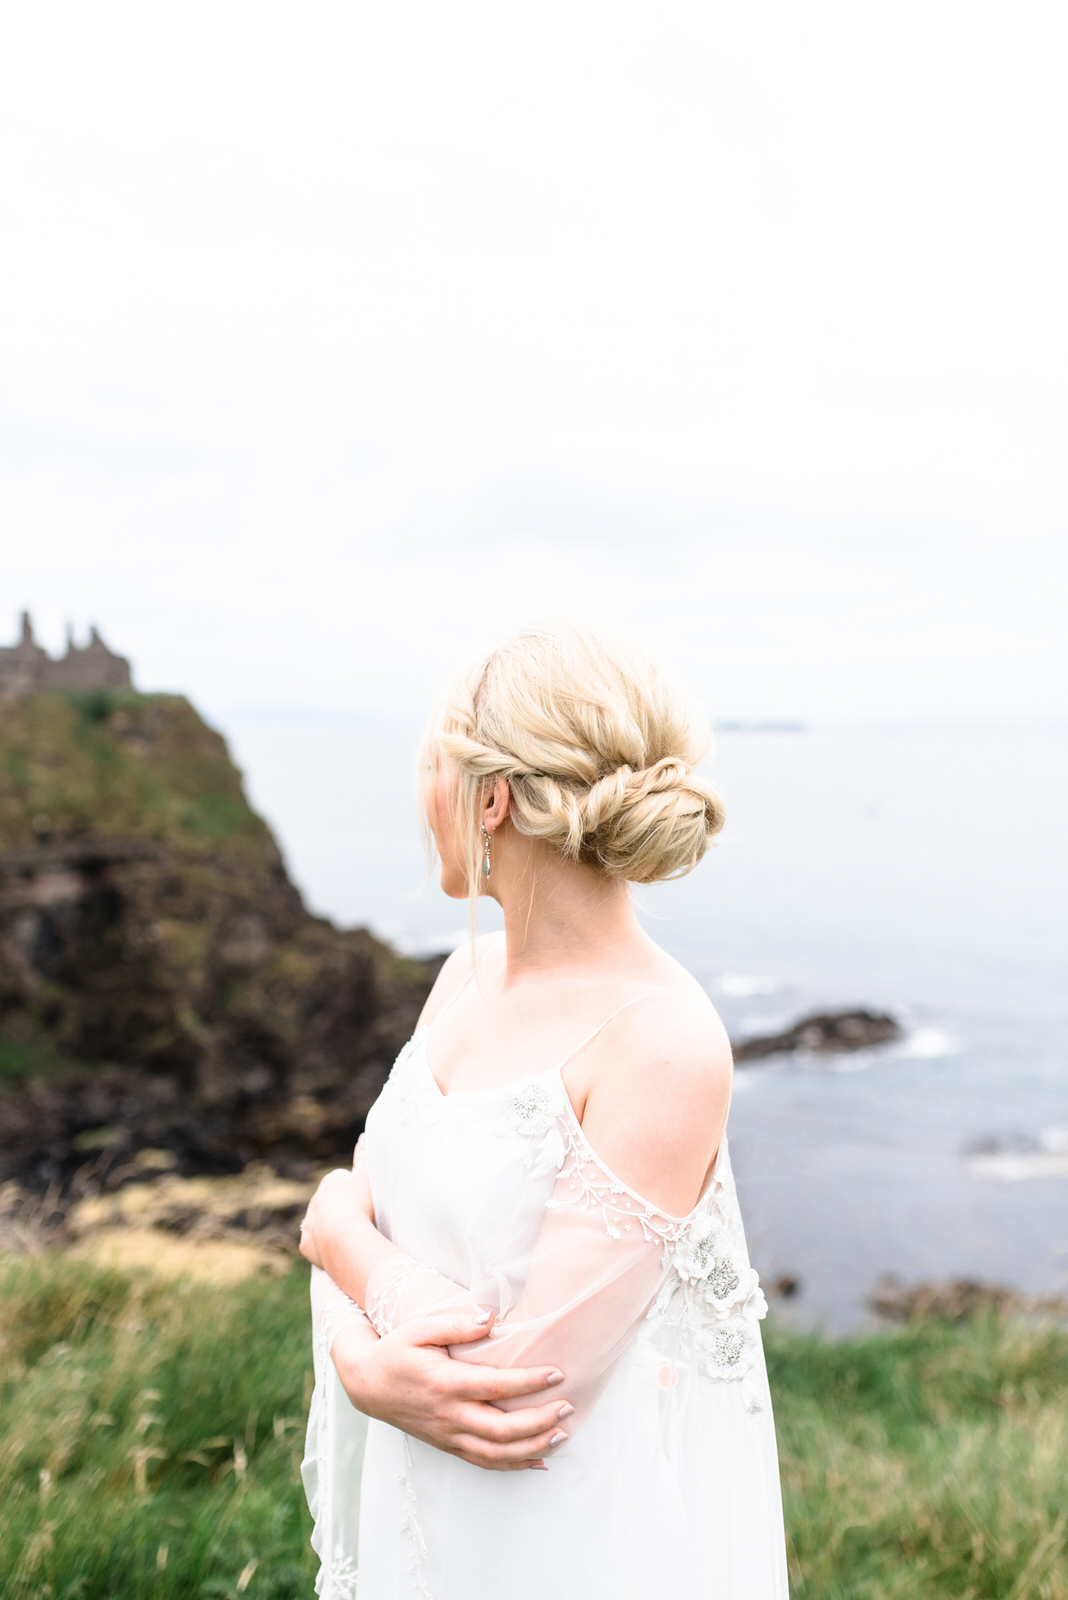 fine art dunluce castle elopement in ireland in sage and white, cliffs of northern ireland, bo and luca wedding dress, wedding hairstyle, blonde hair-1.jpg